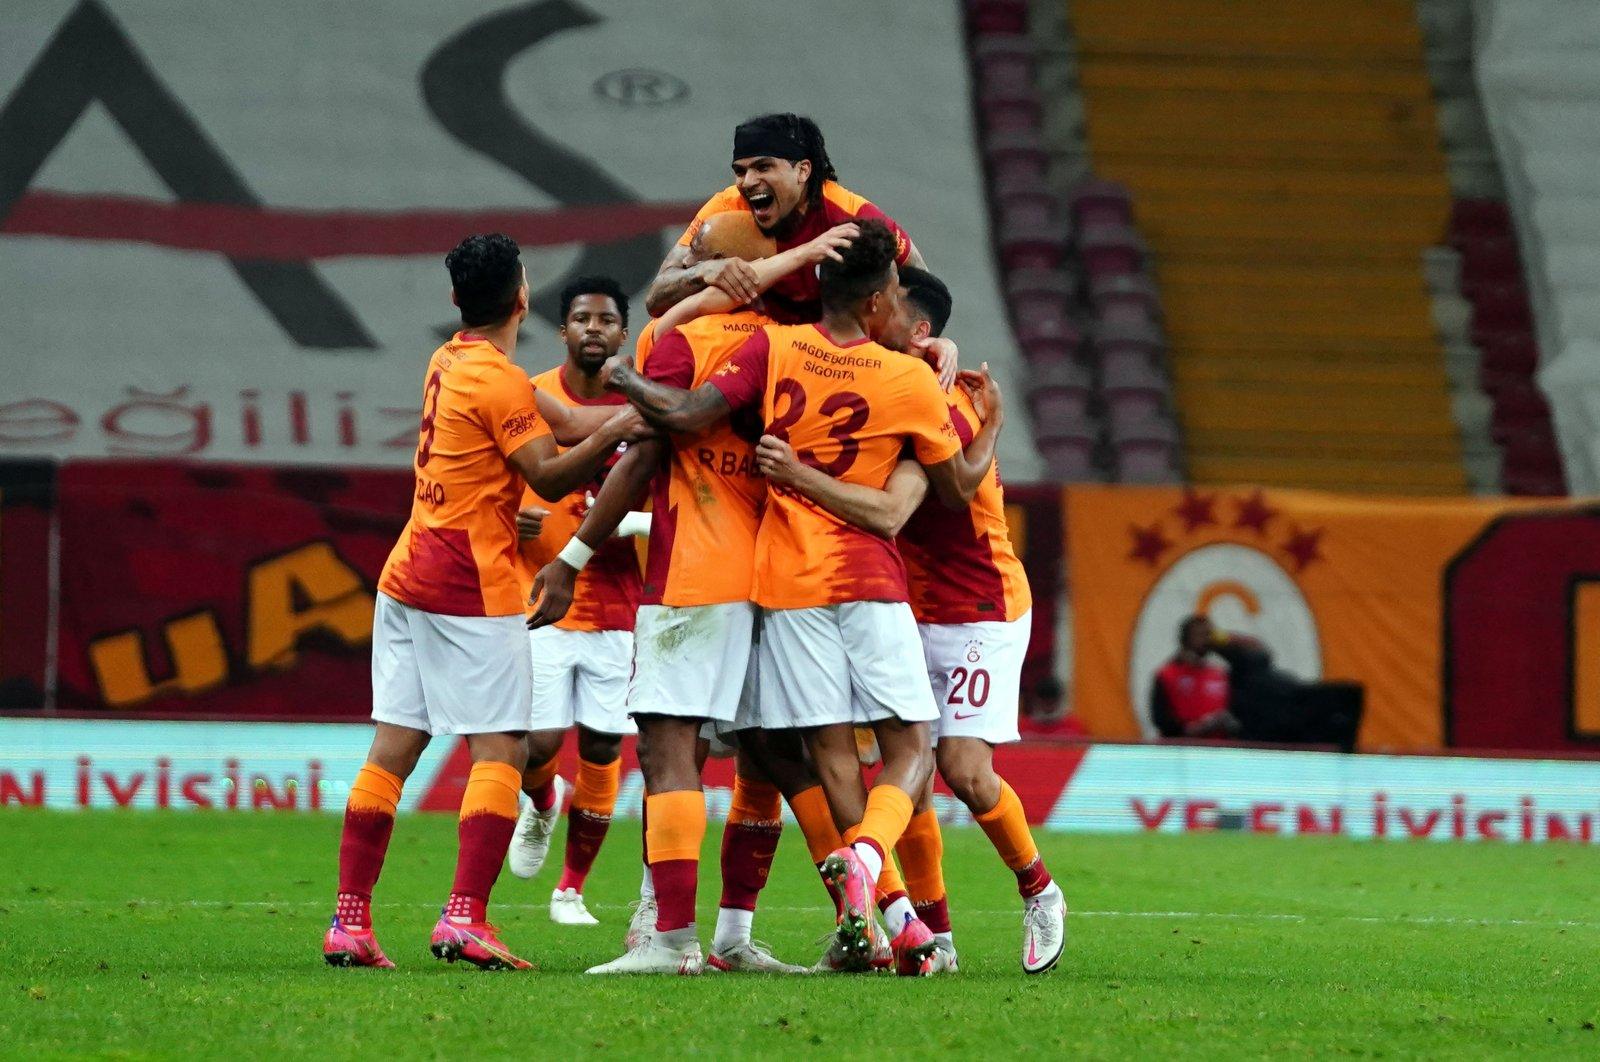 Galatasaray players celebrate their first goal in key Turkish Süper Lig title clash against leader Beşiktaş in Week 40, at the Türk Telekom Stadium in Istanbul, Turkey, May 8, 2021. (IHA Photo)